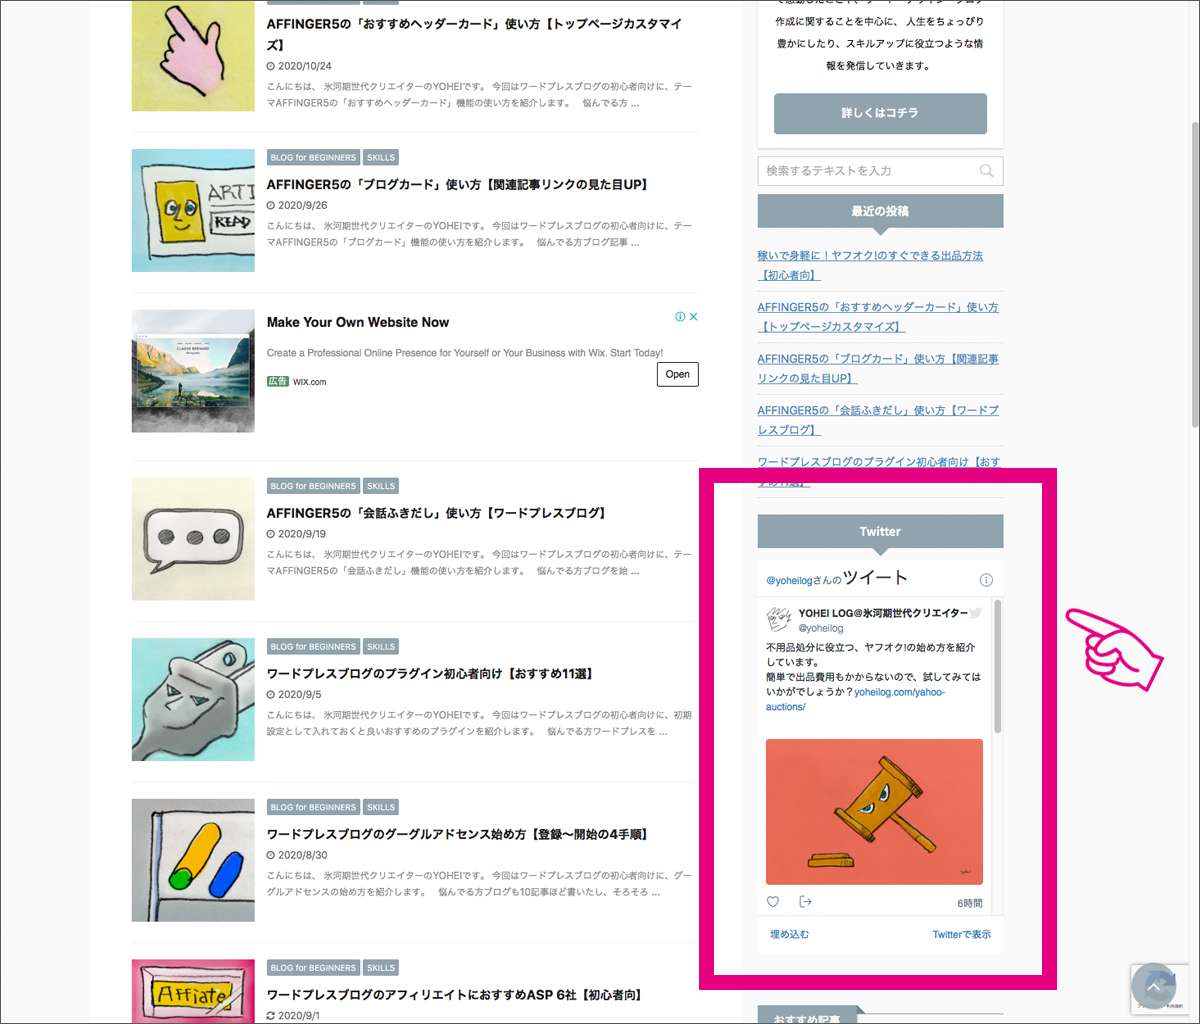 2. AFFINGER5の「Twitter」埋め込み方法【ワードプレスブログと連携】_9